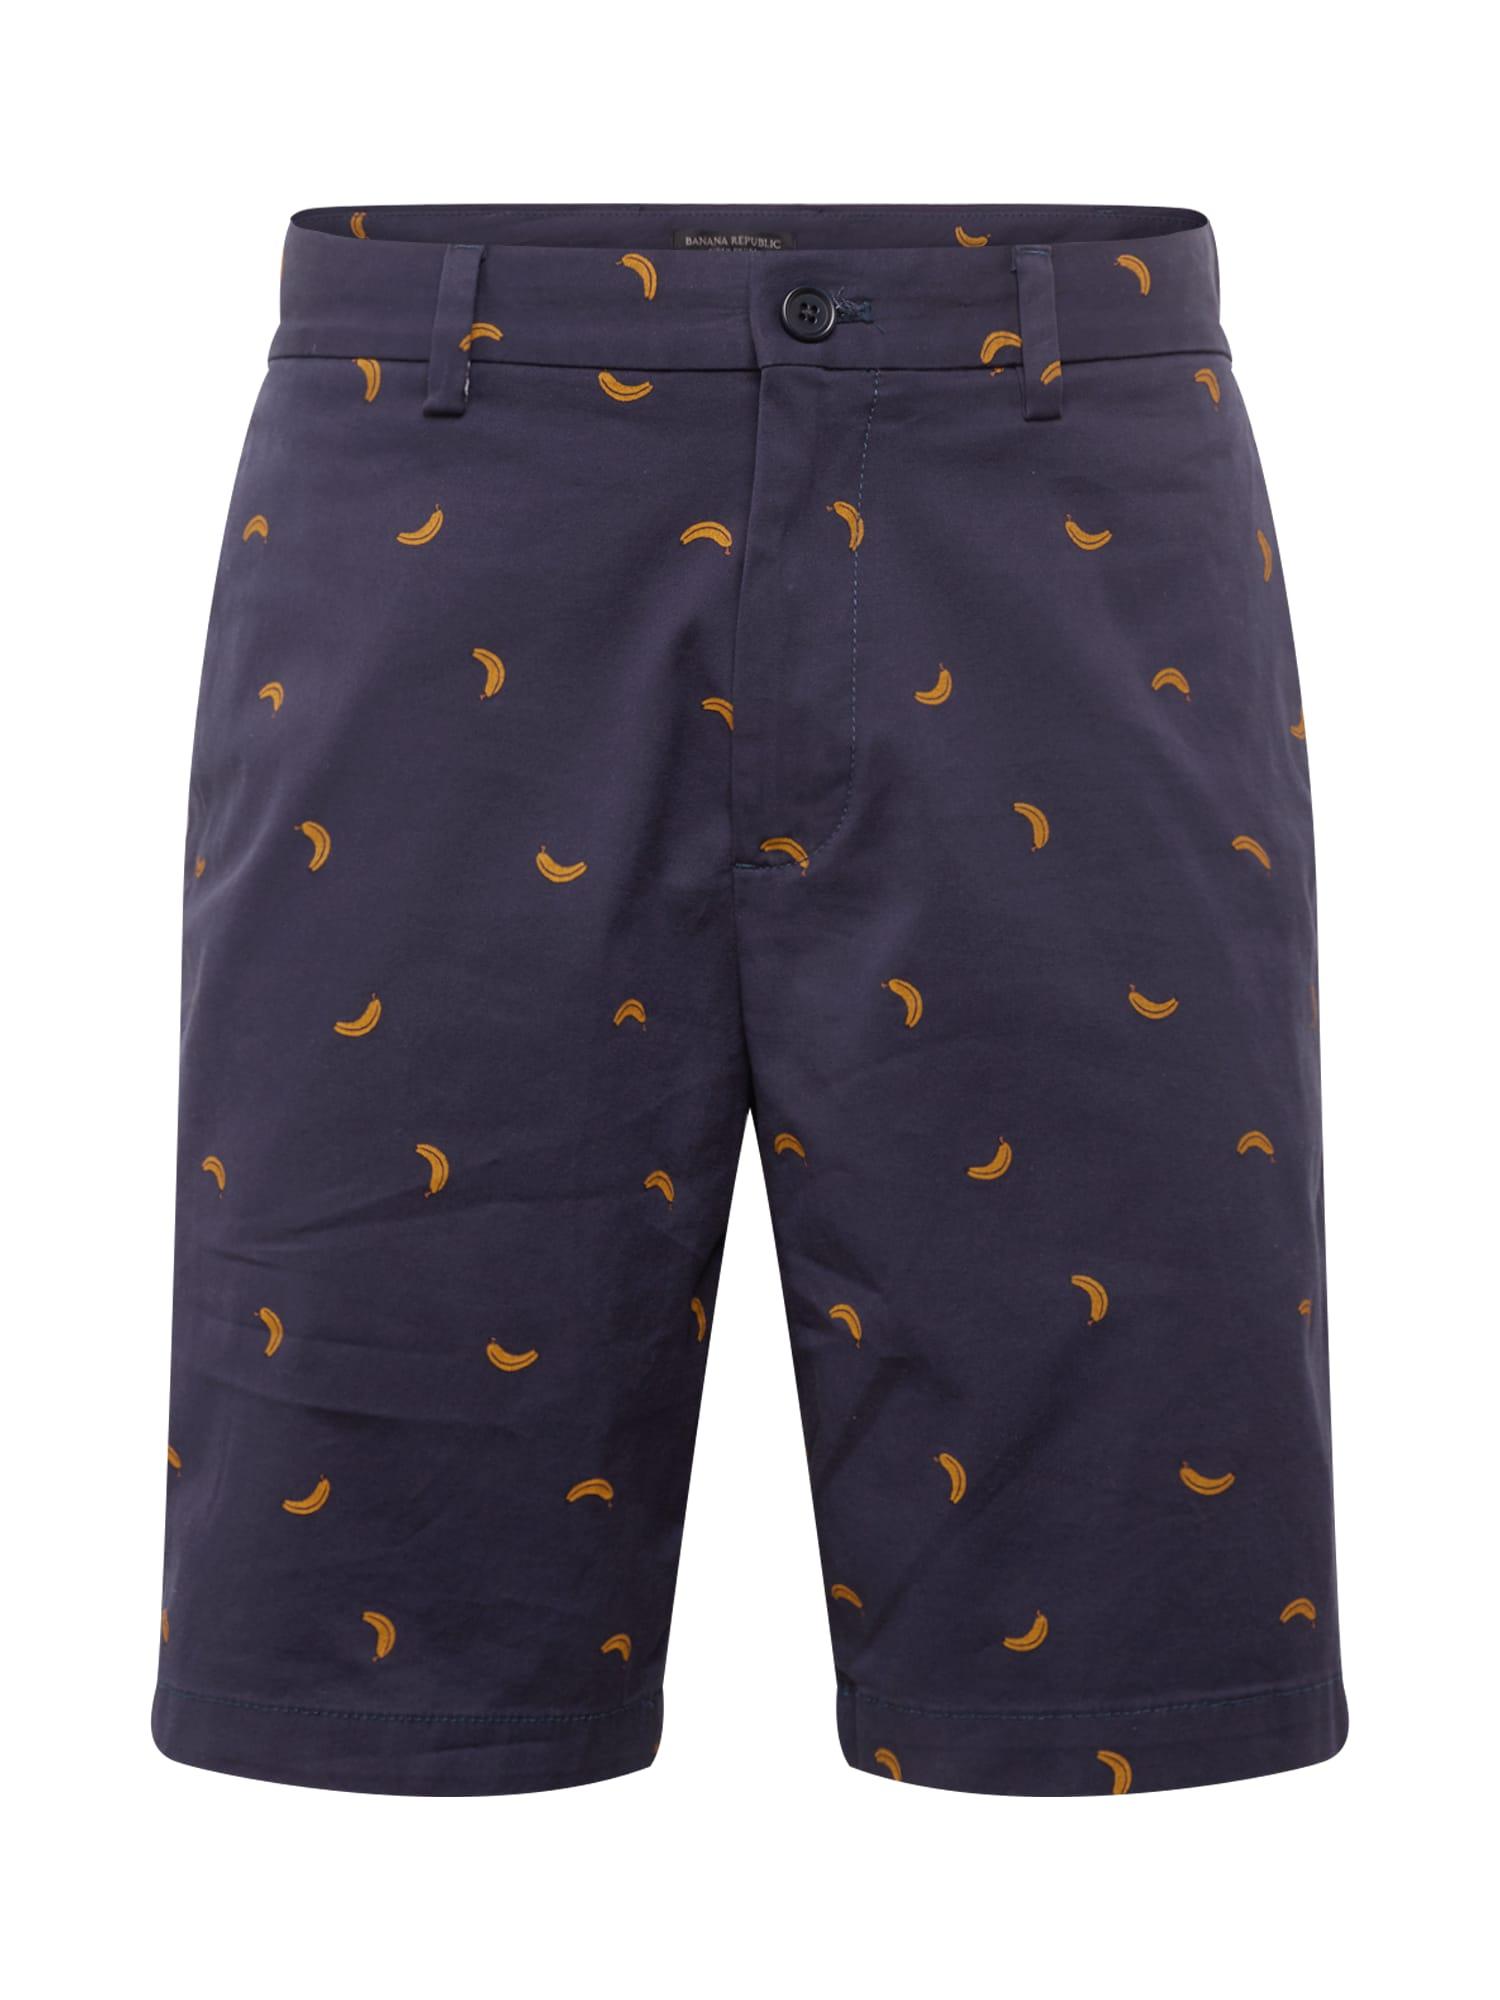 Chino kalhoty AIDEN 9 tmavě modrá žlutá Banana Republic